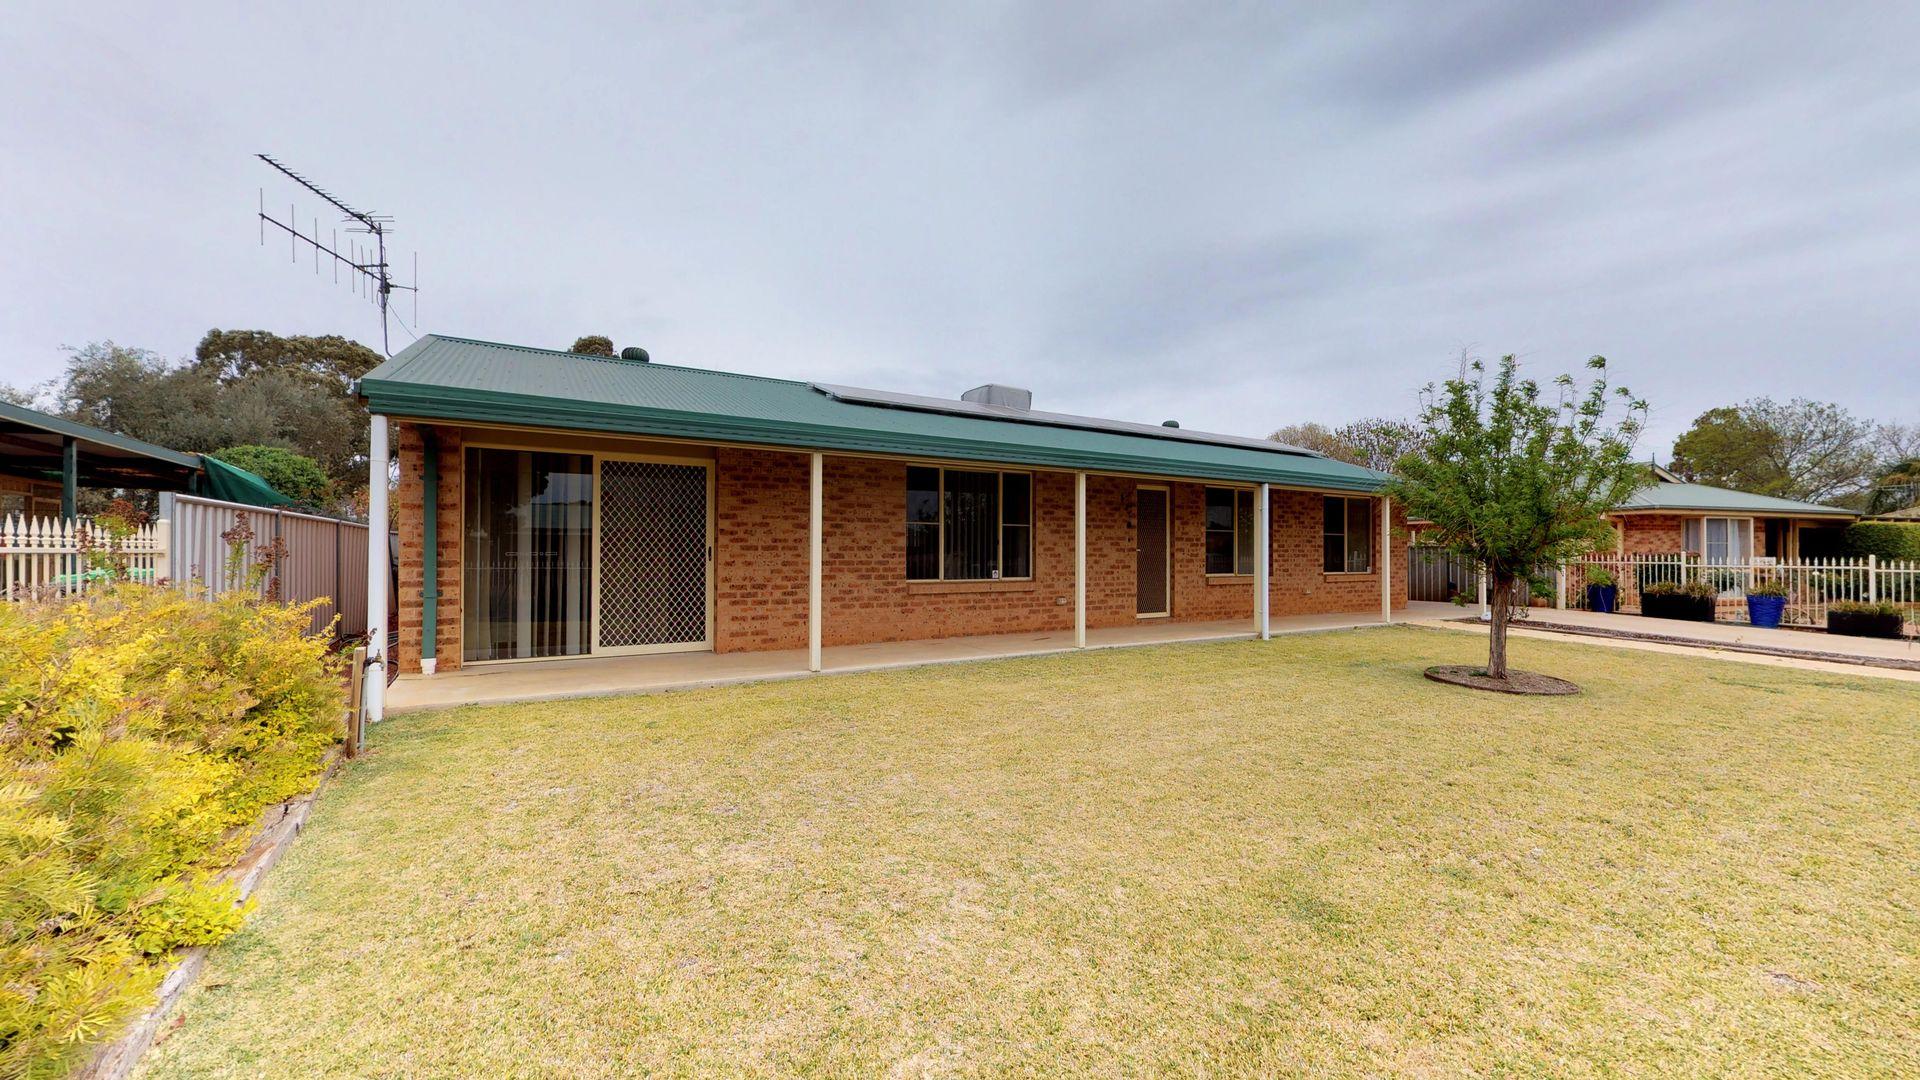 102 Birch Street, Narromine NSW 2821, Image 0